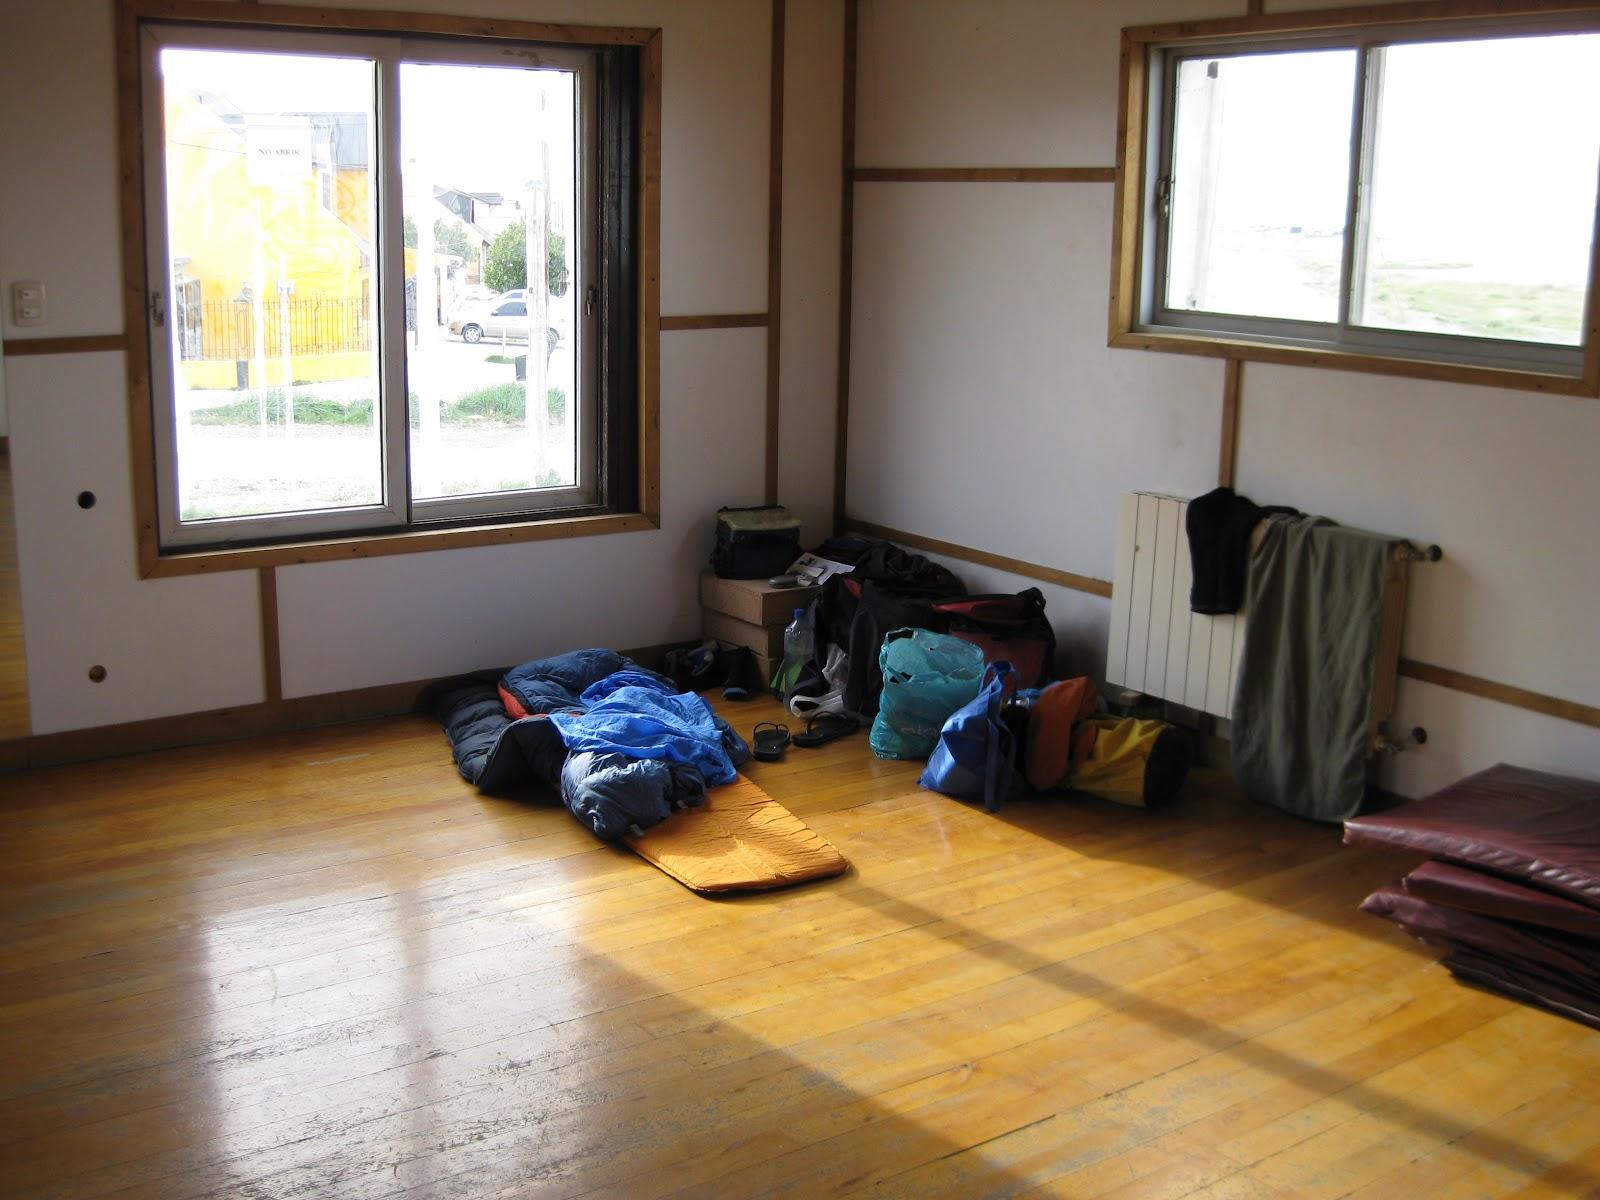 Sleeping in a dojo at Club Nautico